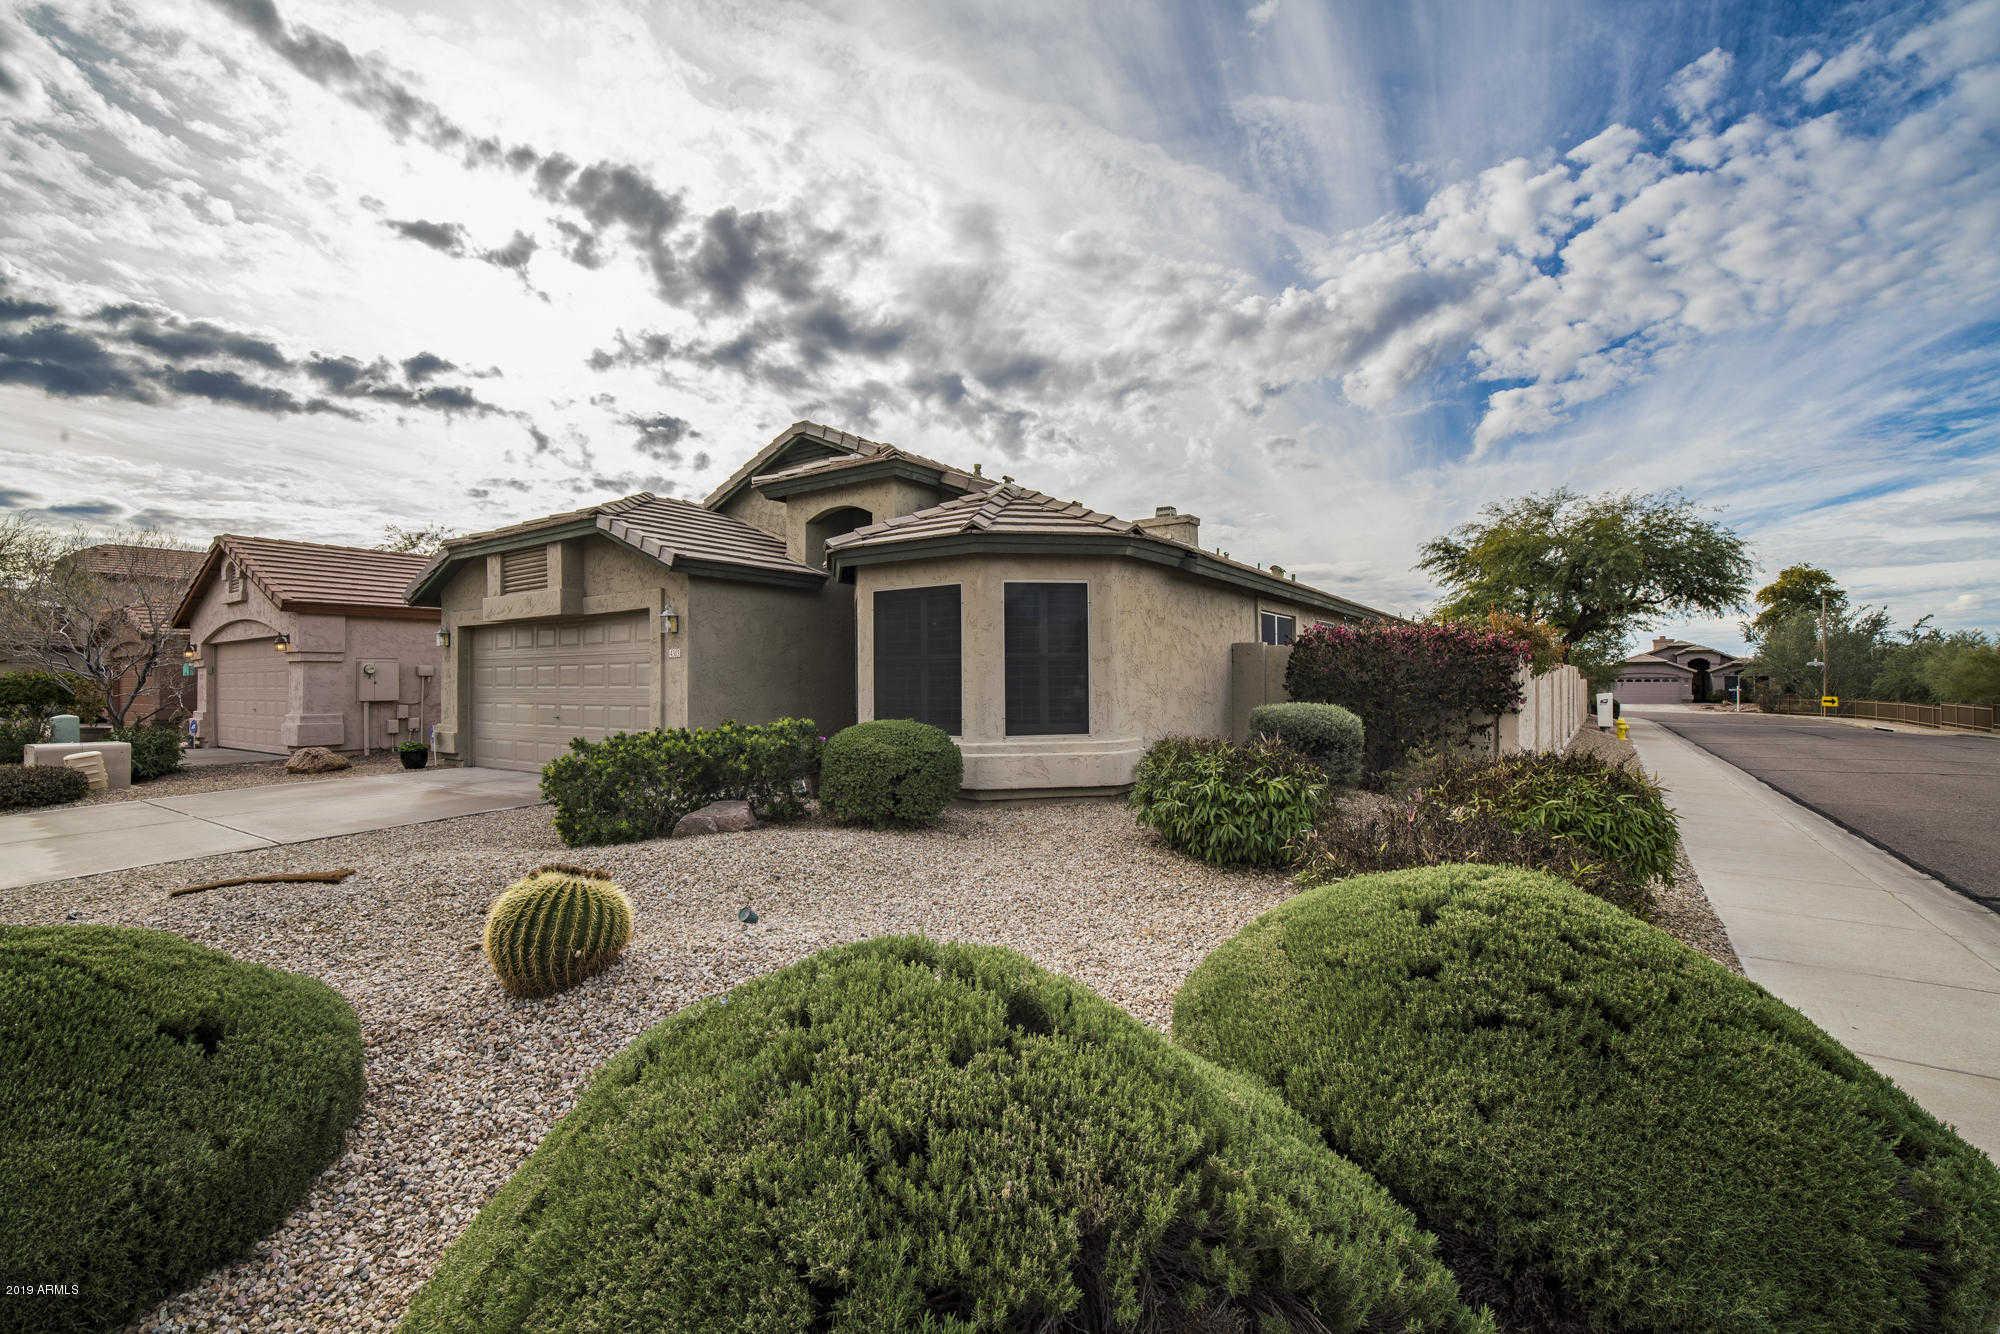 $362,000 - 3Br/2Ba - Home for Sale in Desert Ridge Parcel 7.9, Phoenix